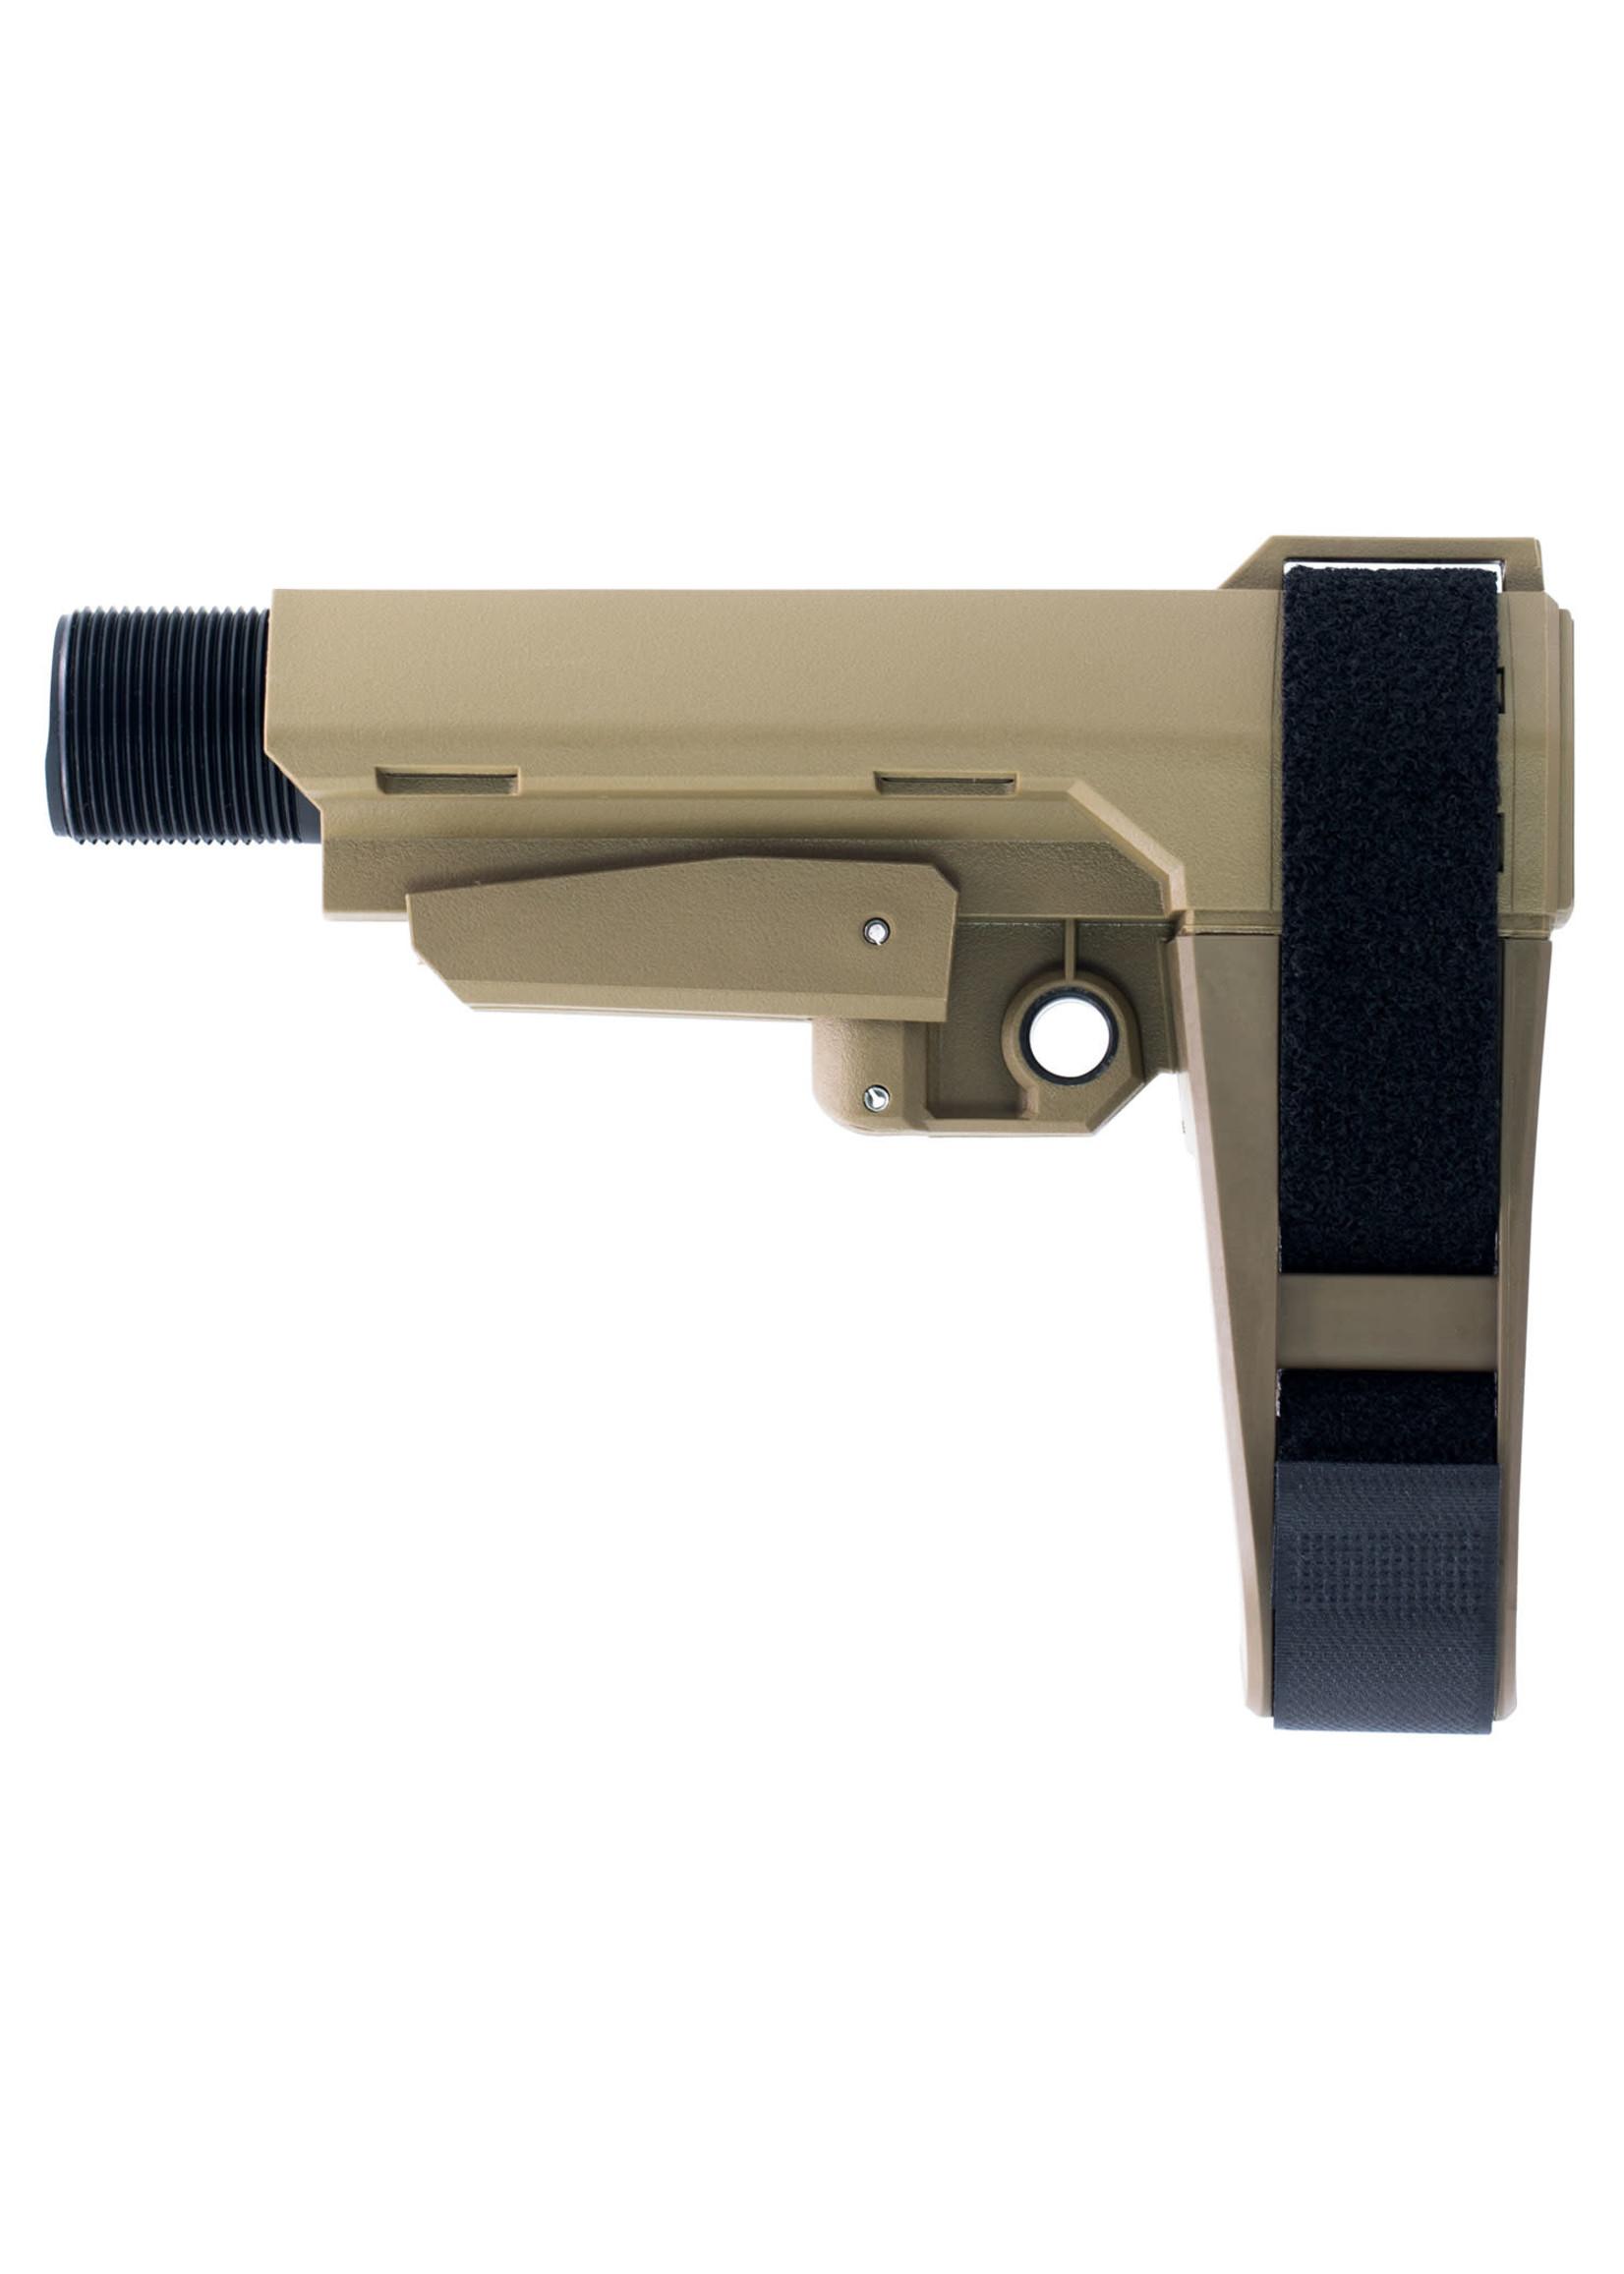 SB Tactical SB Tactical AR Brace SBA3 Flat Dark Earth Elasto-Polymer 6-Position Adjustable